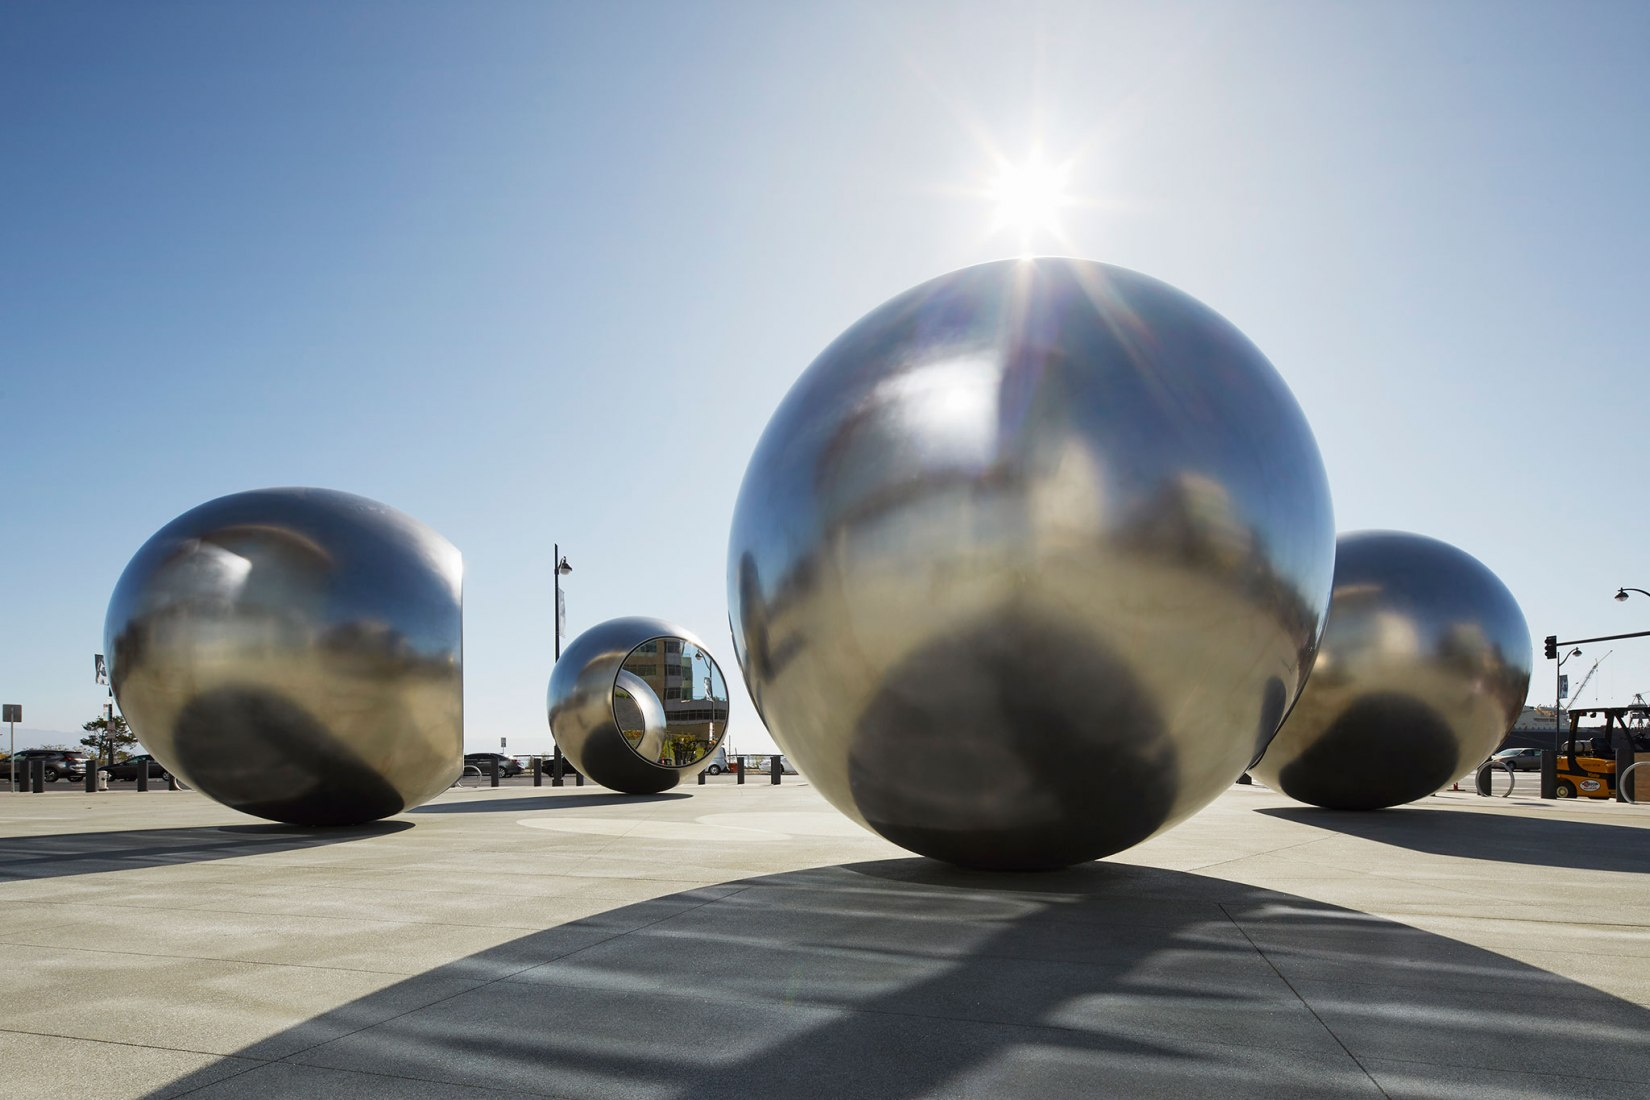 Seeing spheres, 2019, Chase Center, San Francisco, por Olafur Eliasson. Acero inoxidable, vidrio, plata, fibra de vidrio, LED de 4,8 x 22 x 22 metros cada esfera ⌀ 4.8 metros. Fotografía por Matthew Millman